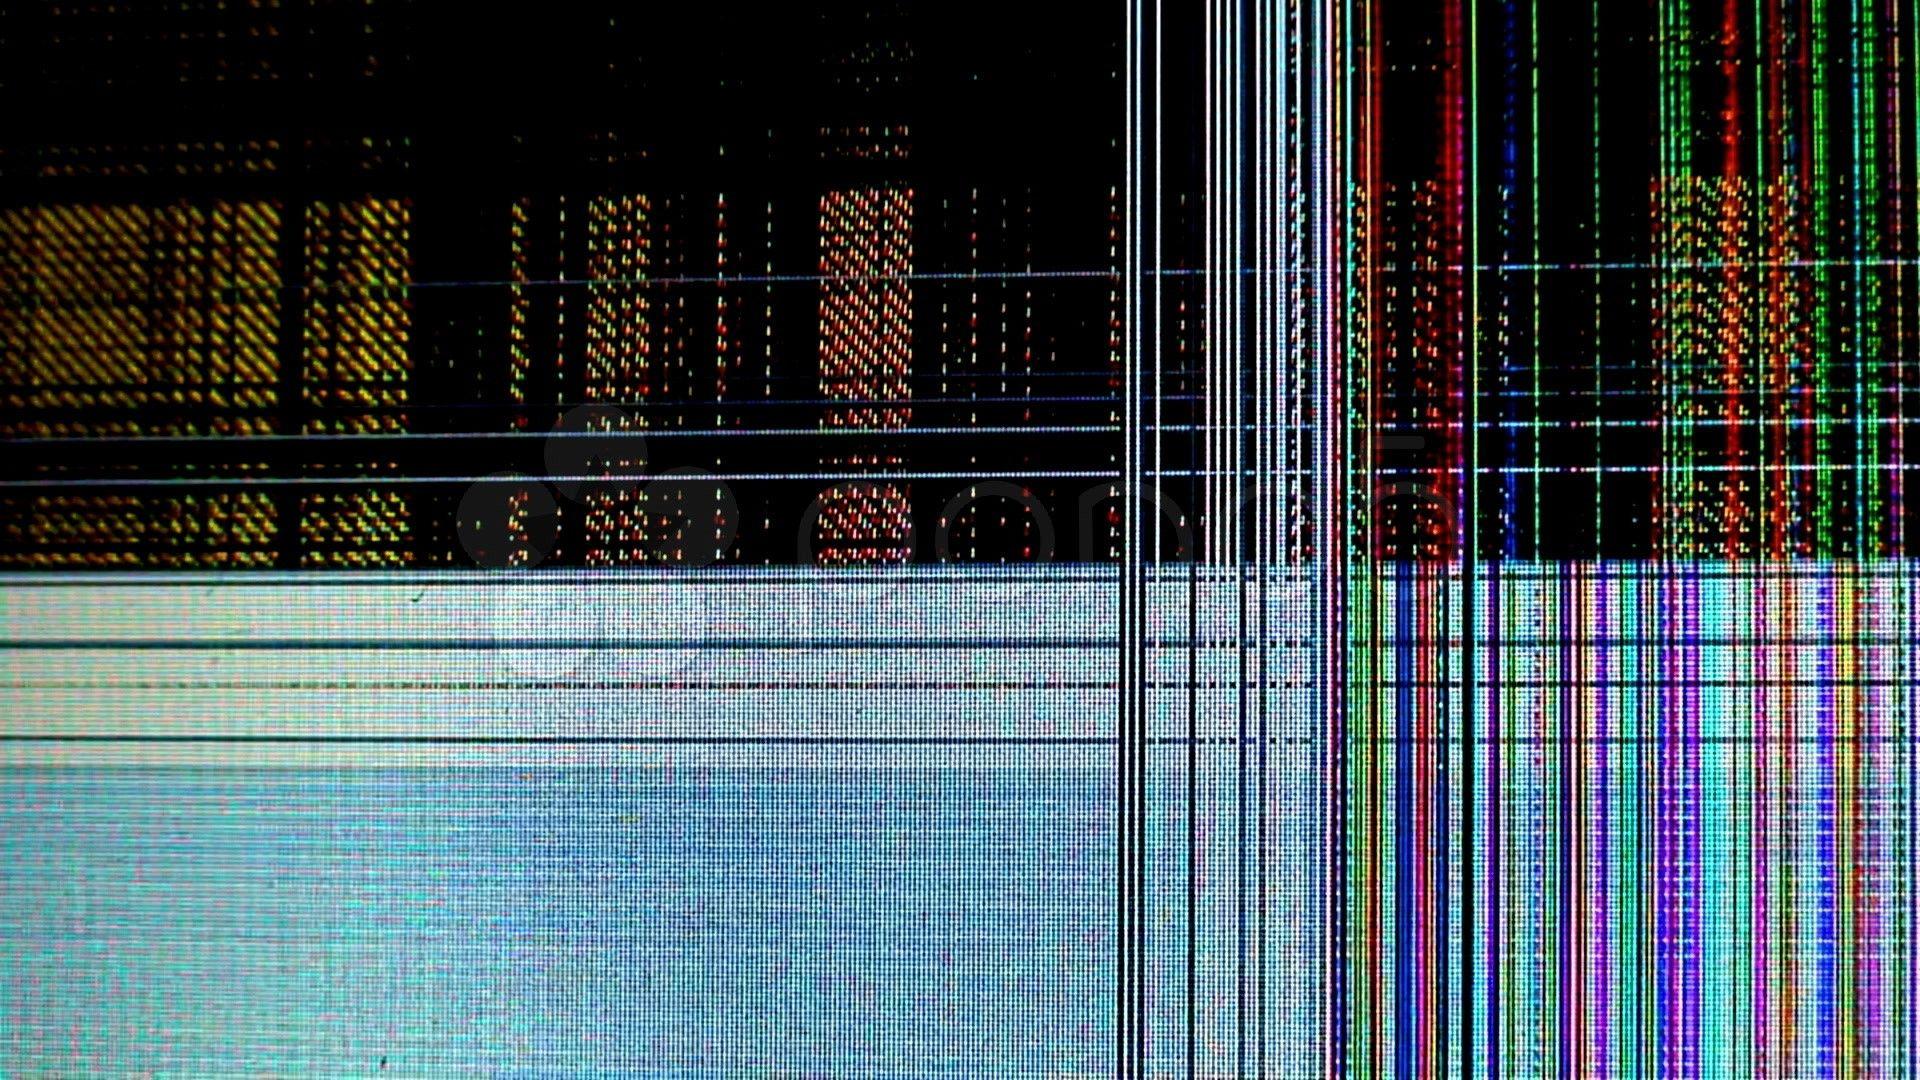 cracked phone screen background